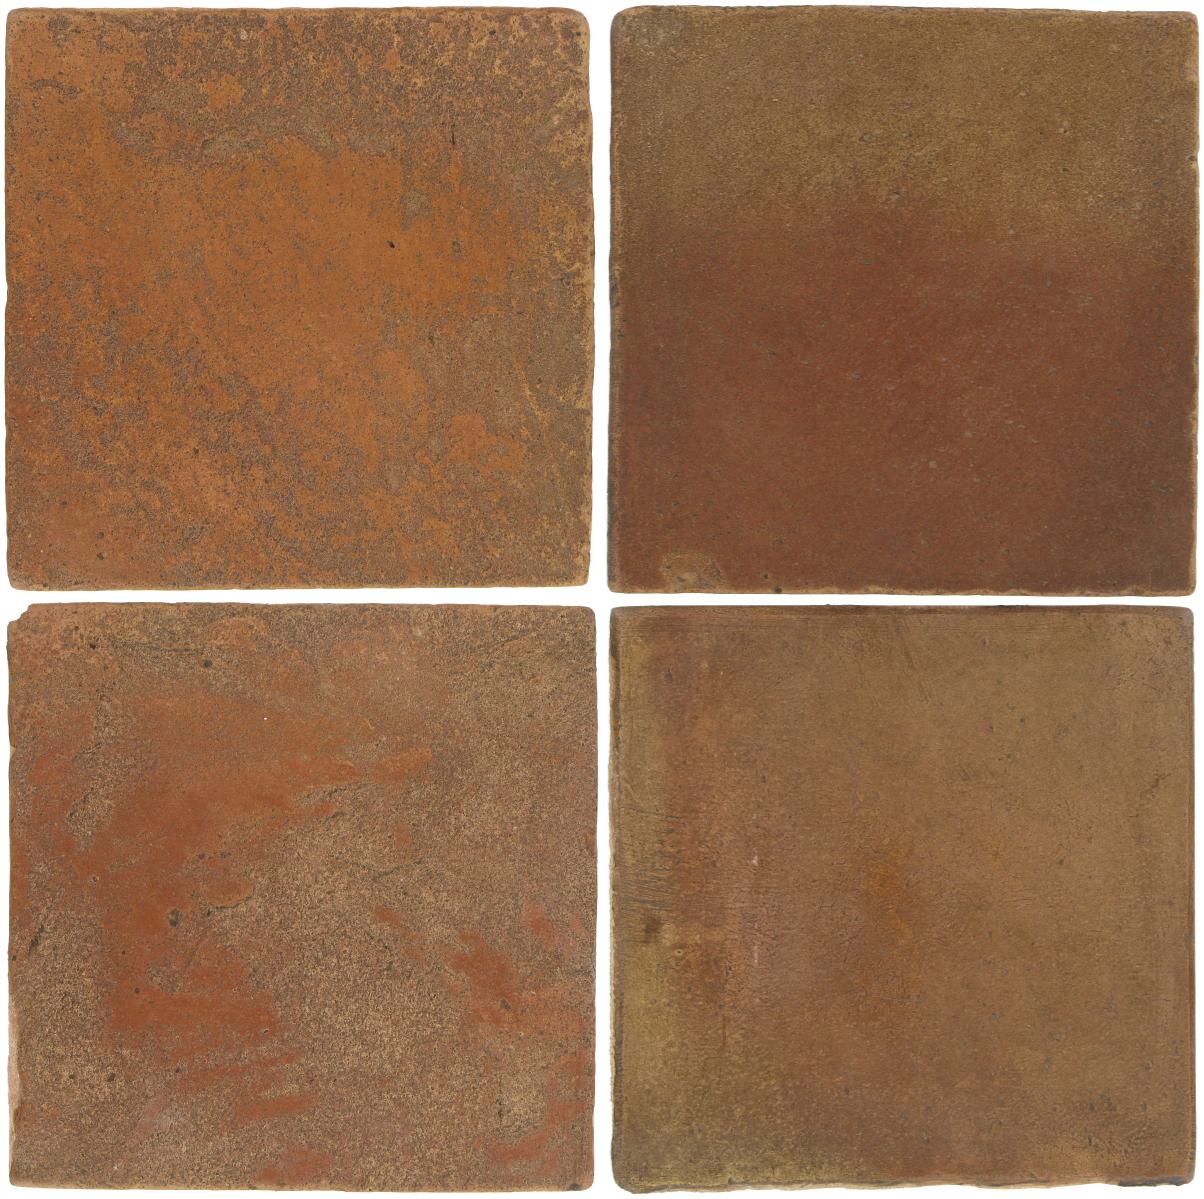 Pedralbes Antique Terracotta  2 Color Combinations  VTG-PSTR Traditional + OHS-PSCM Camel Brown